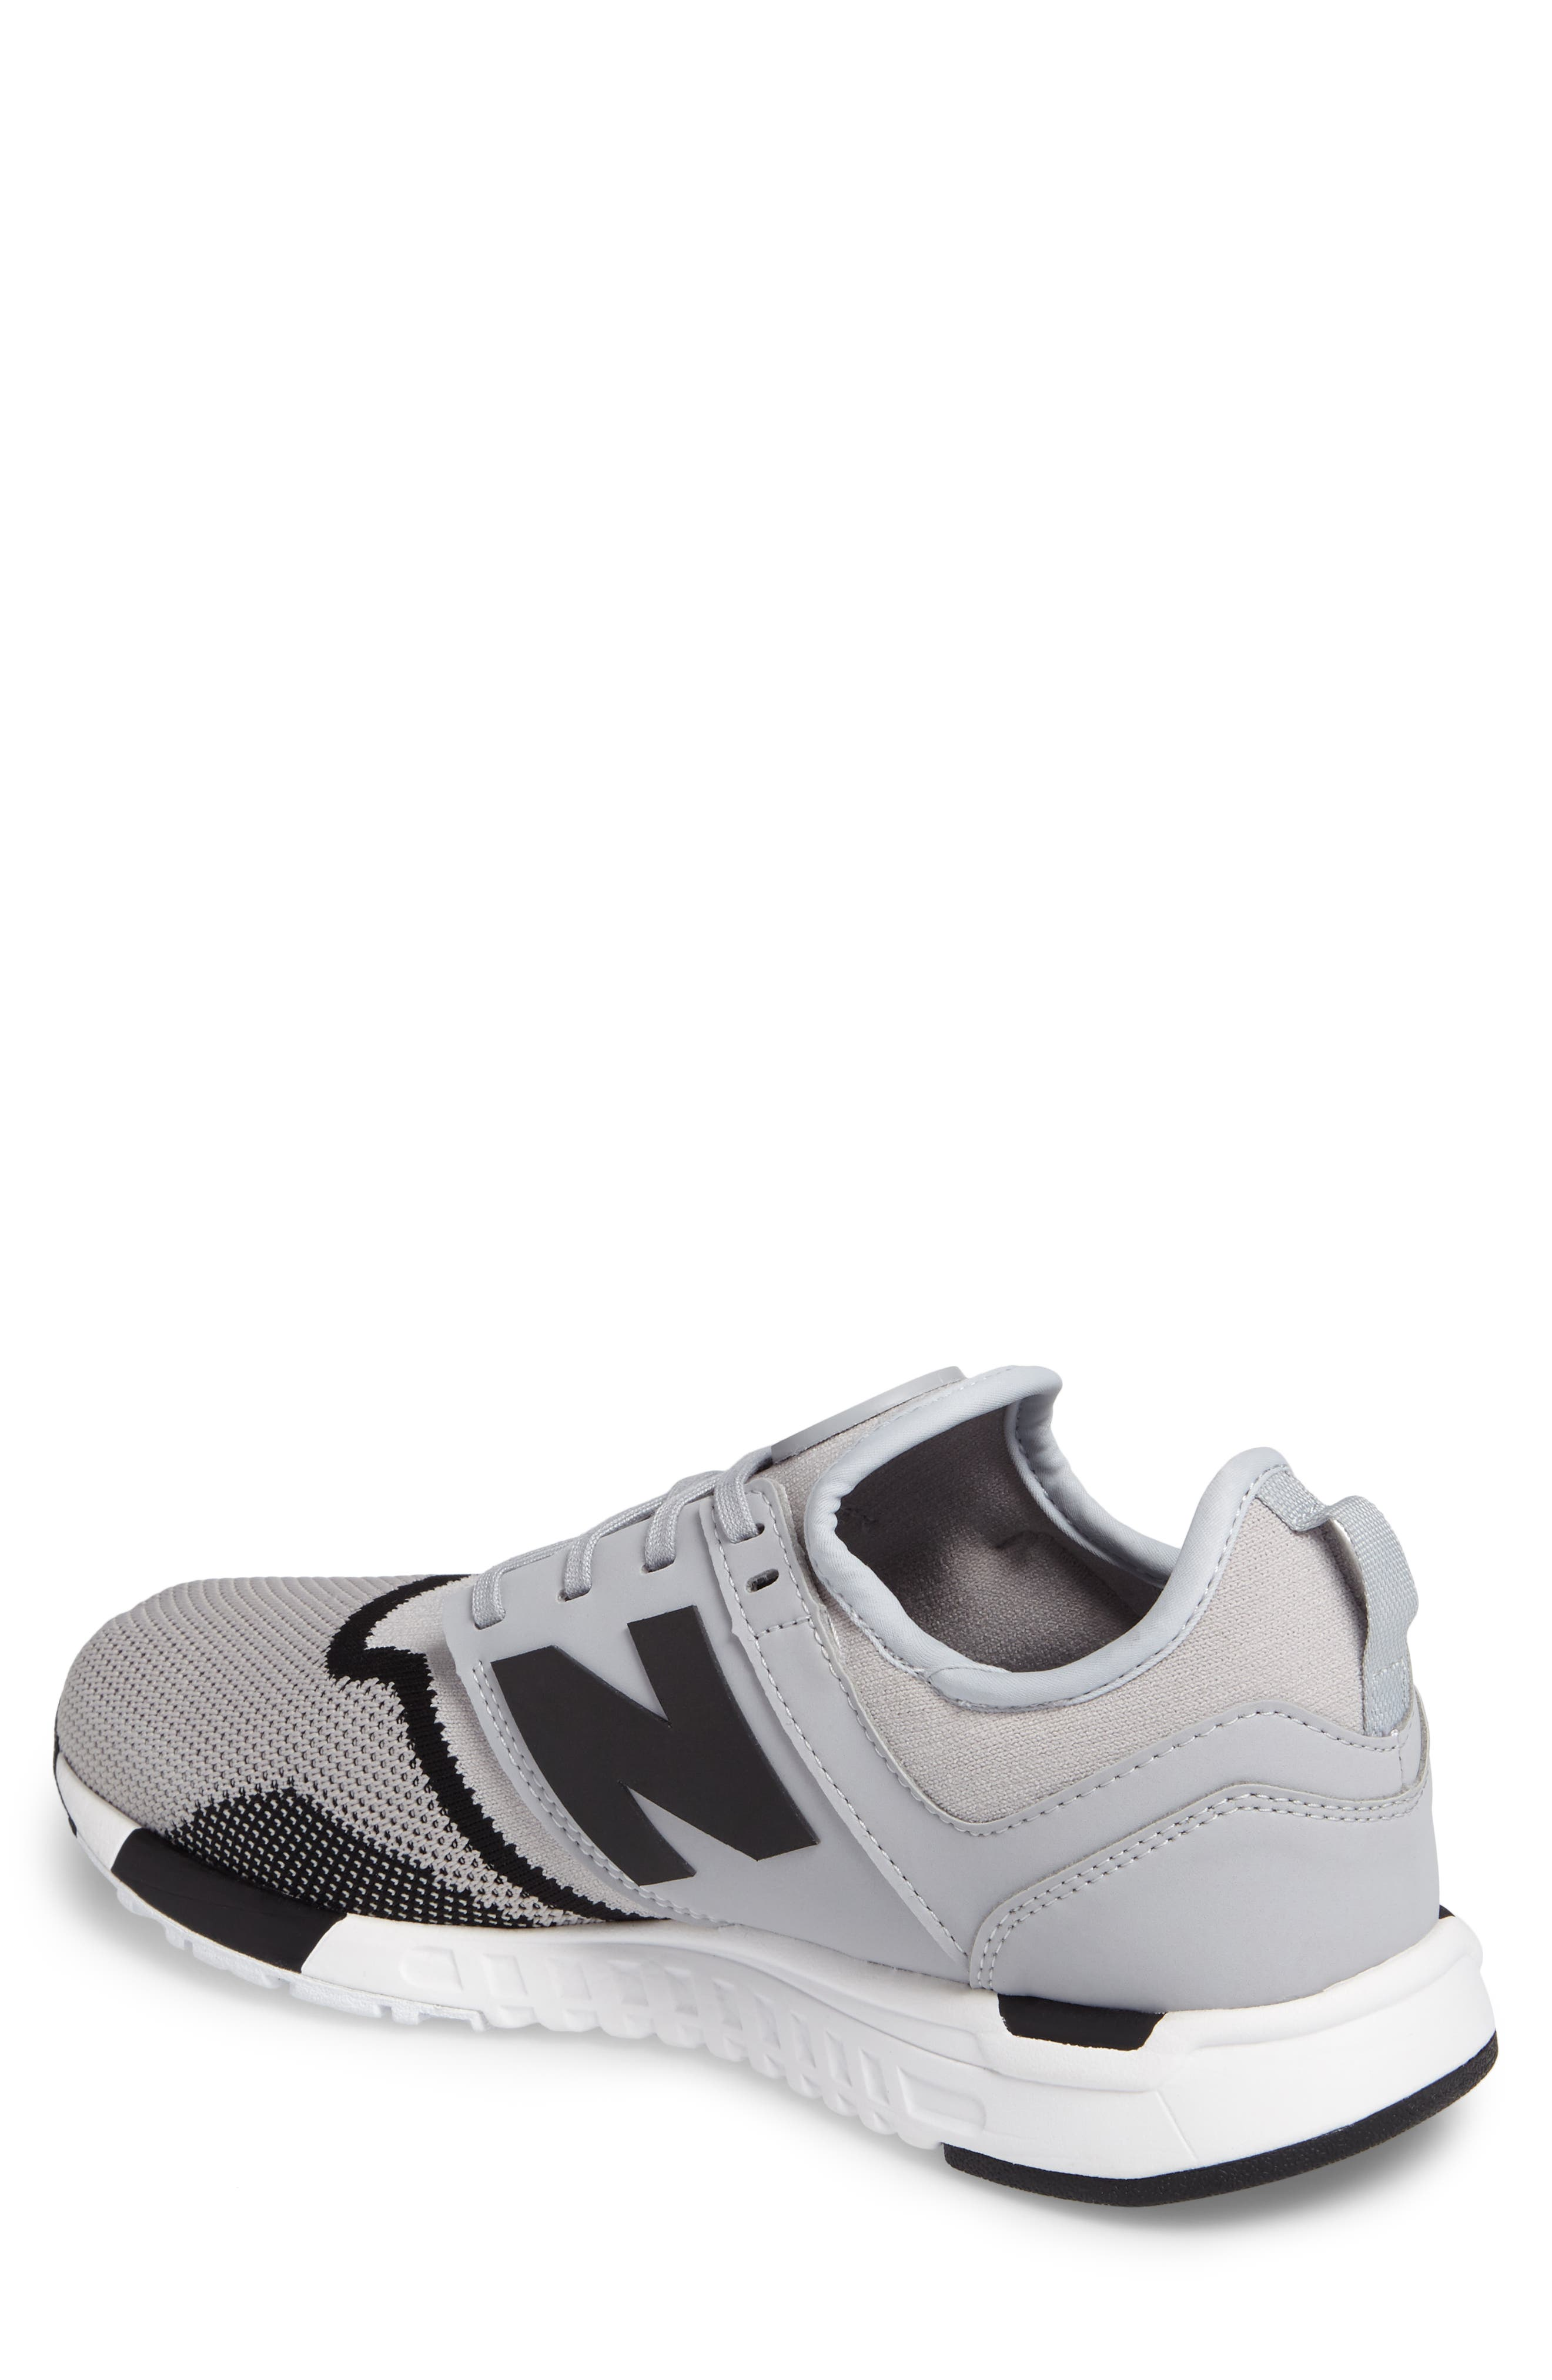 Alternate Image 2  - New Balance 247 Sport Knit Sneaker (Men)